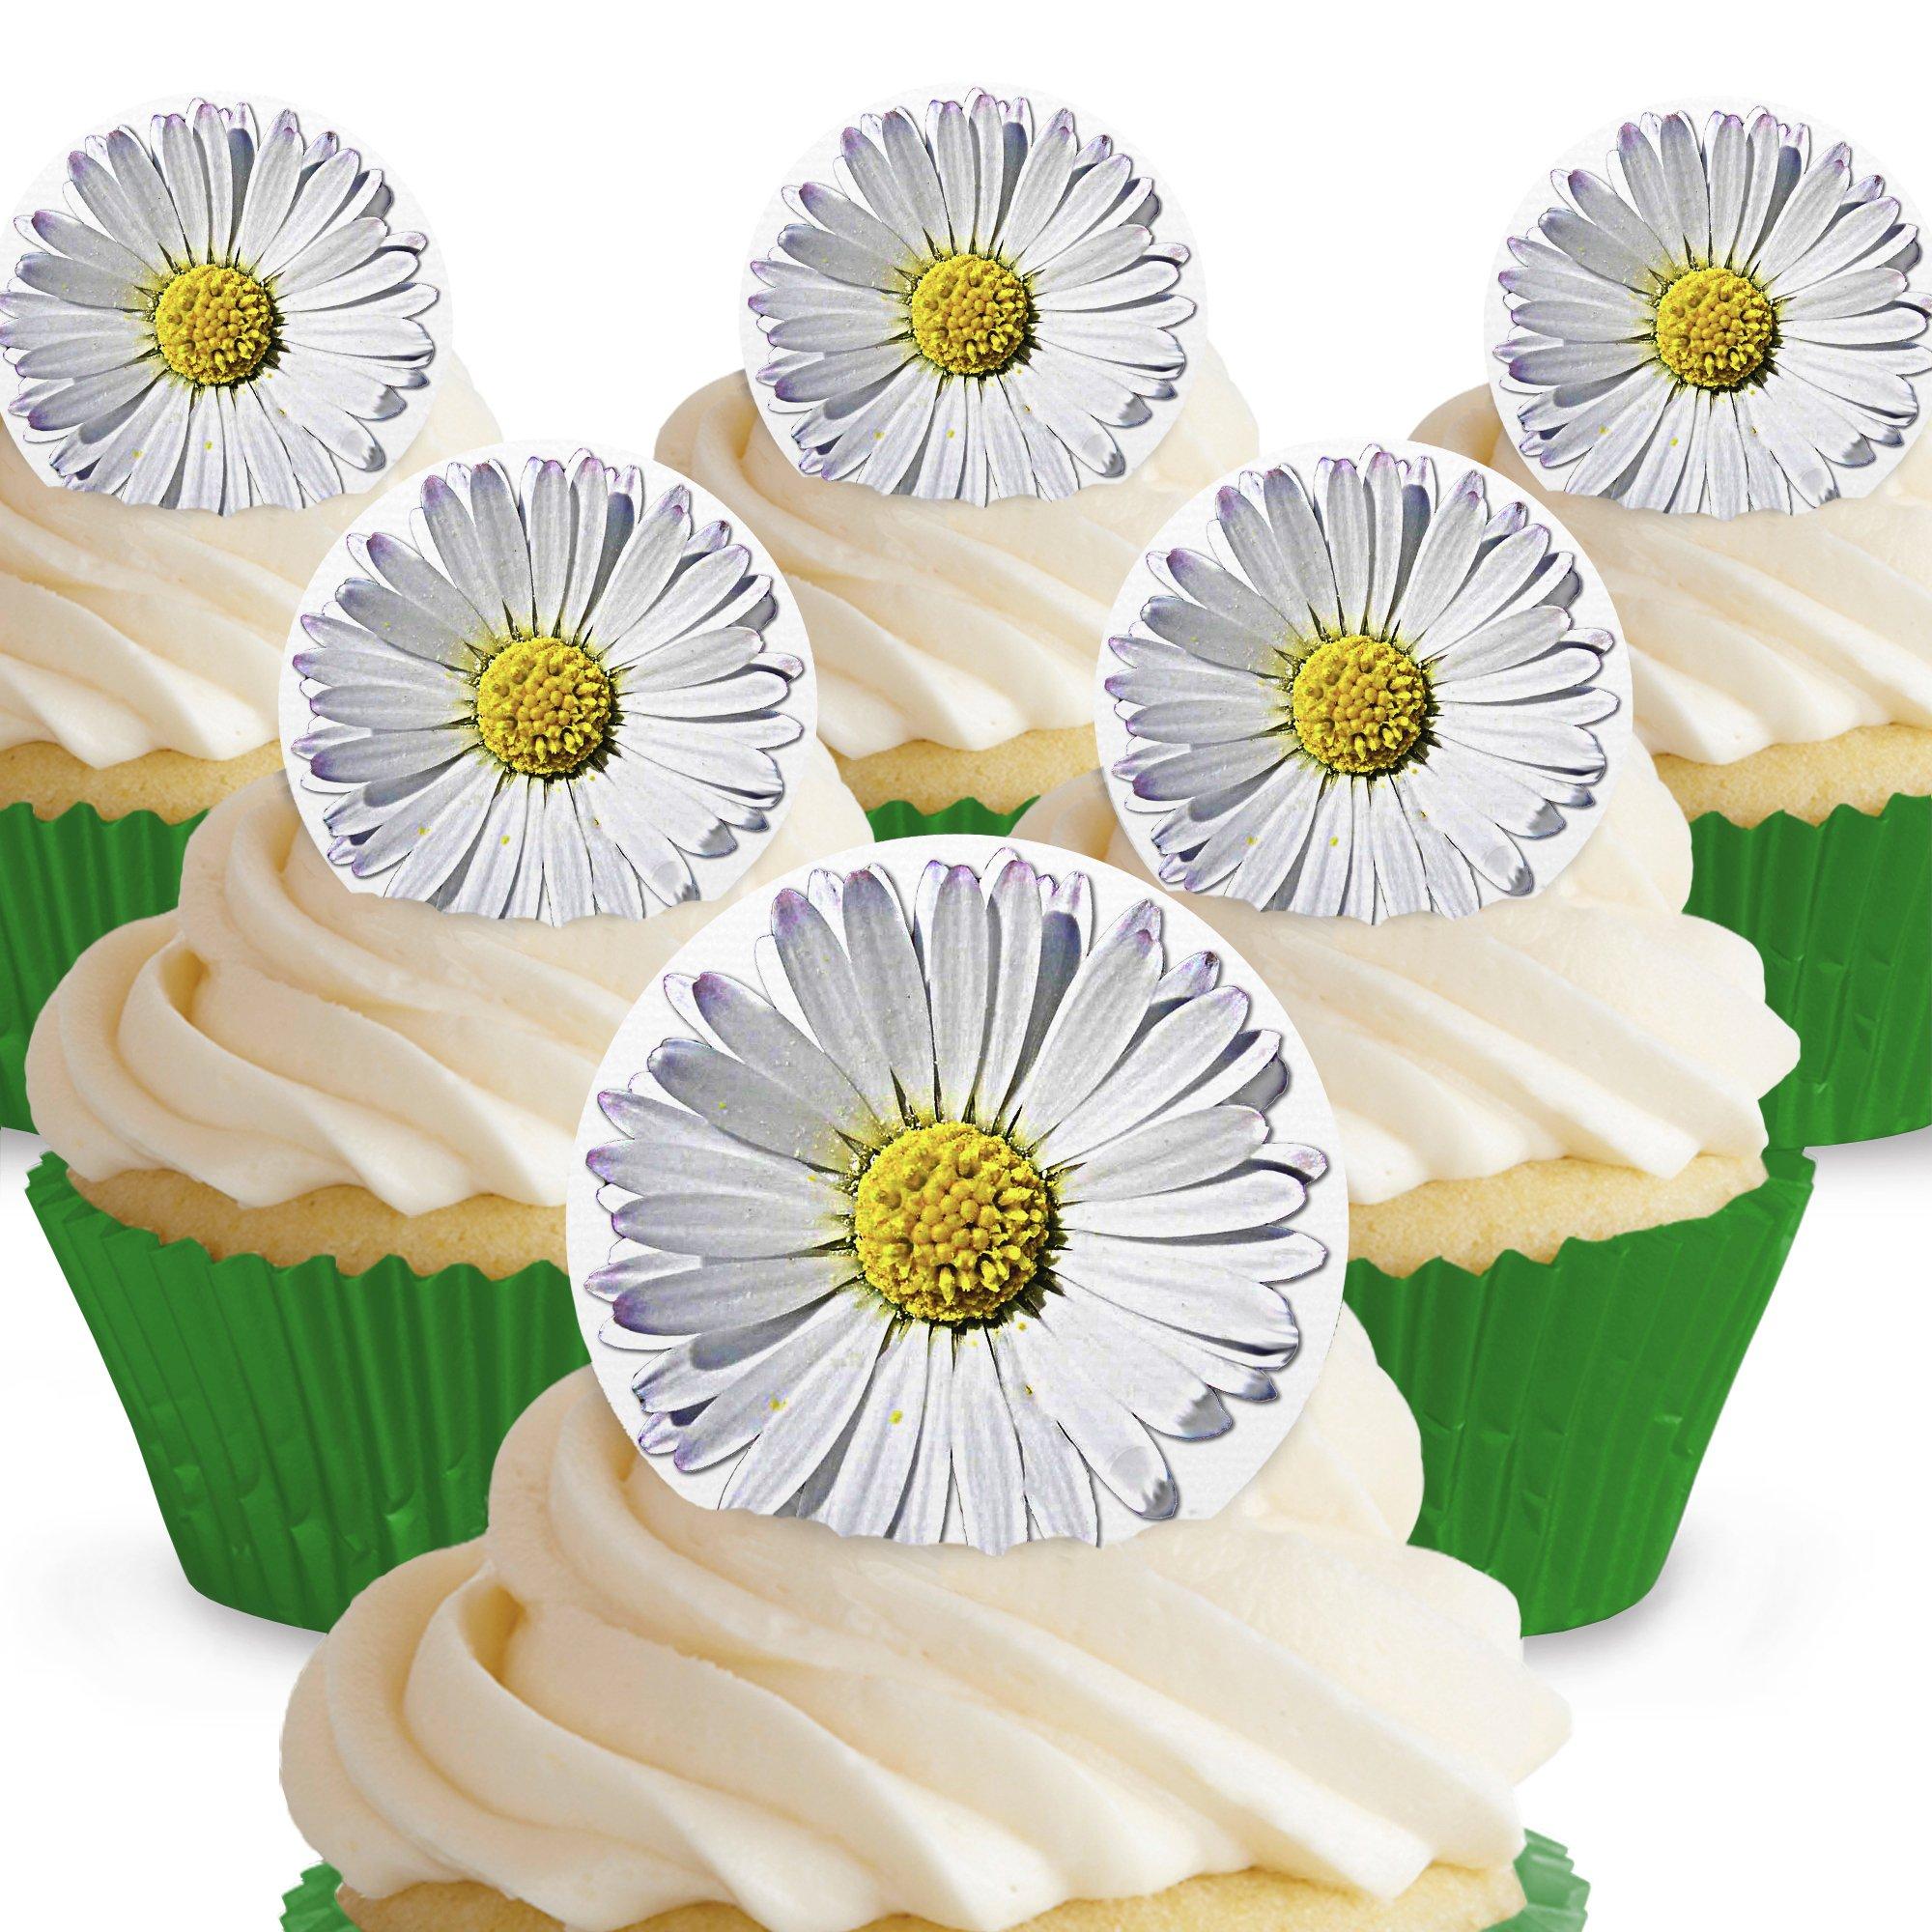 Cakeshop 12 X Pre Cut Pink Gerbera Flowers Edible Cake Toppers